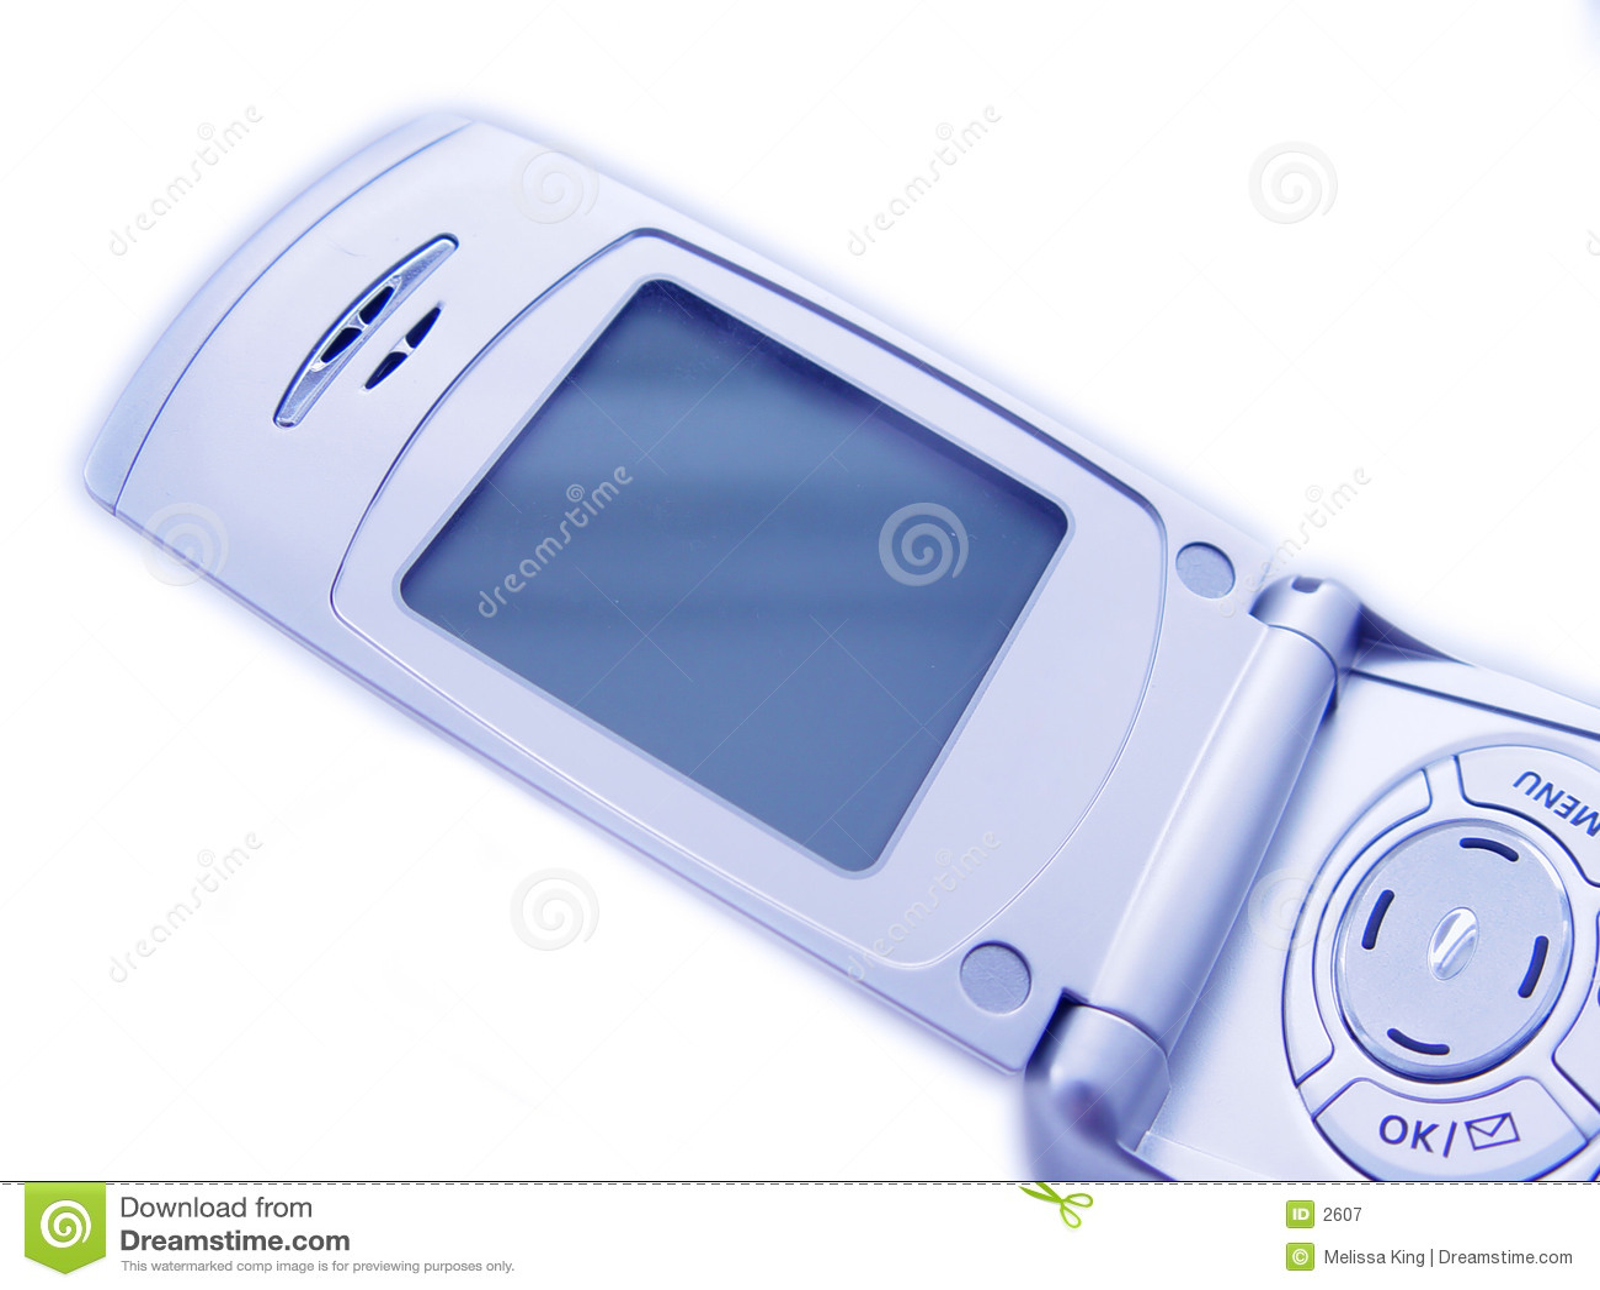 Blank mobiltelefonskärm